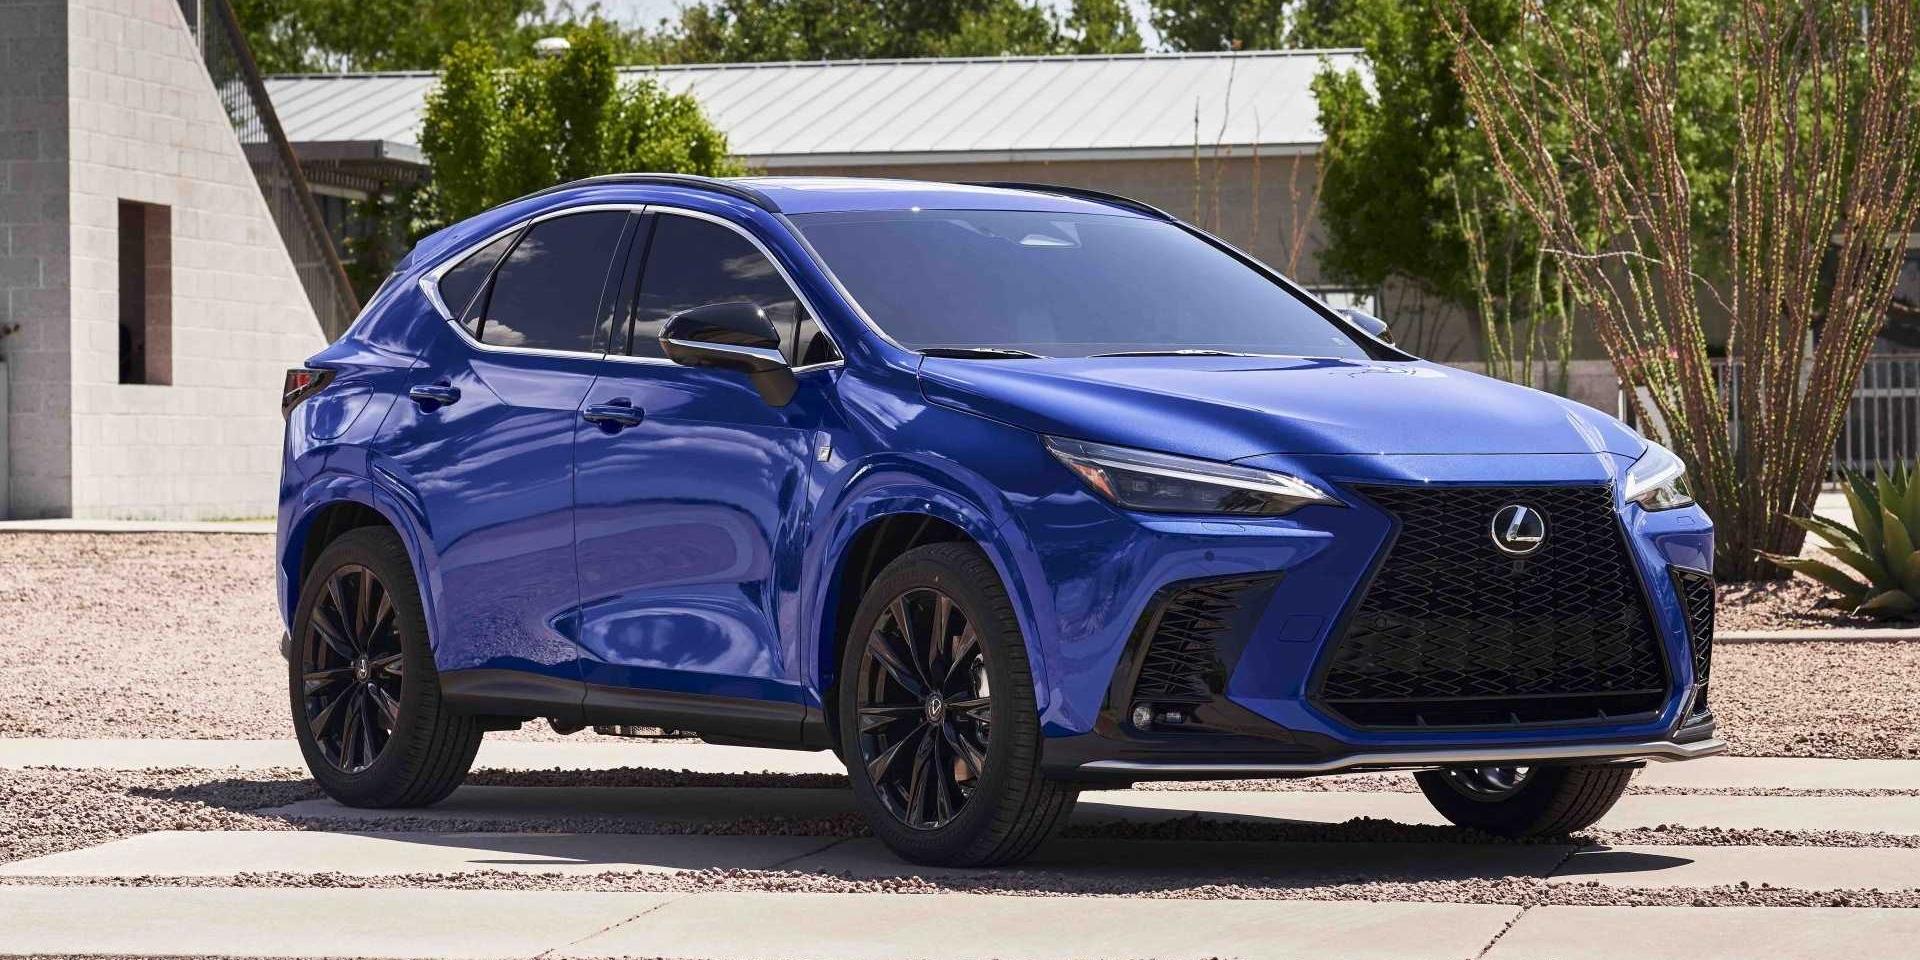 2.4L渦輪、2.5L PHEV上身!Lexus NX大改款正式發表!